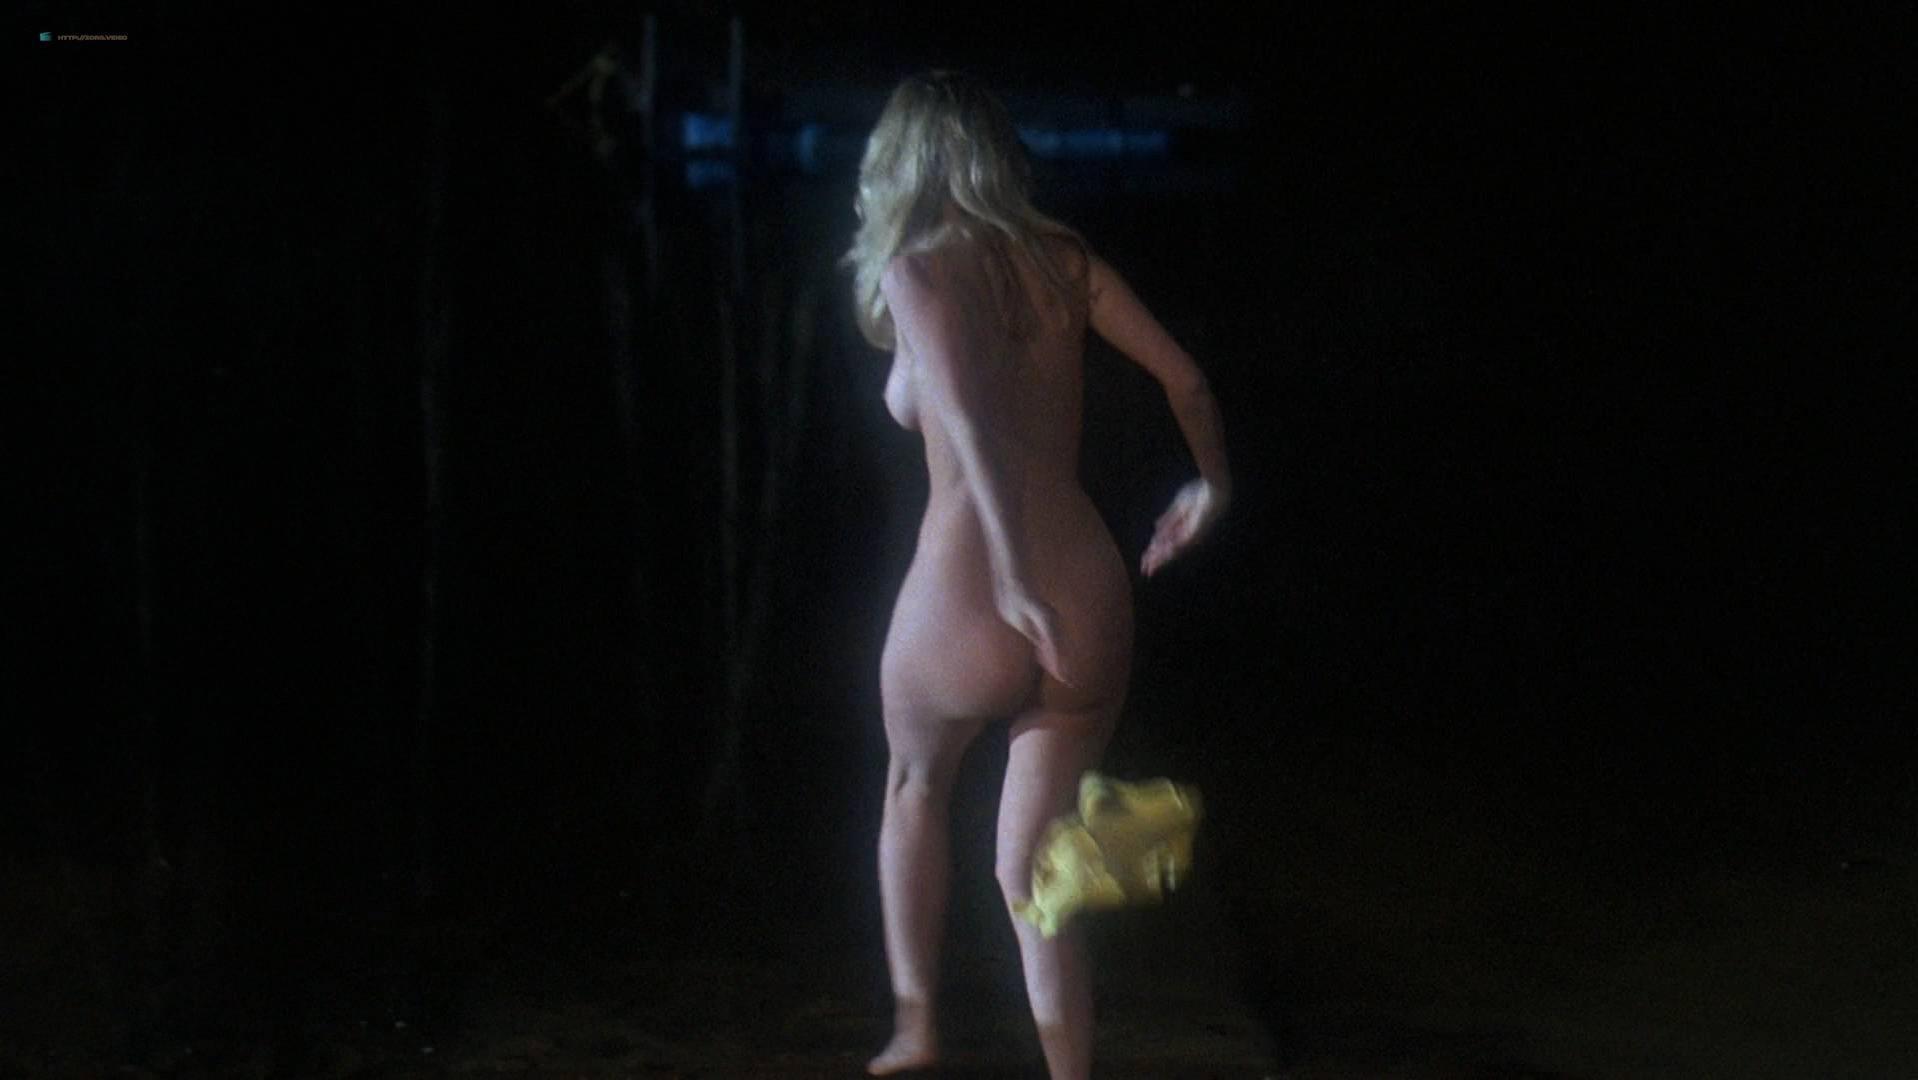 Elizabeth Kaitan nude, Heidi Kozak nude - Friday The 13th Part VII (1988)